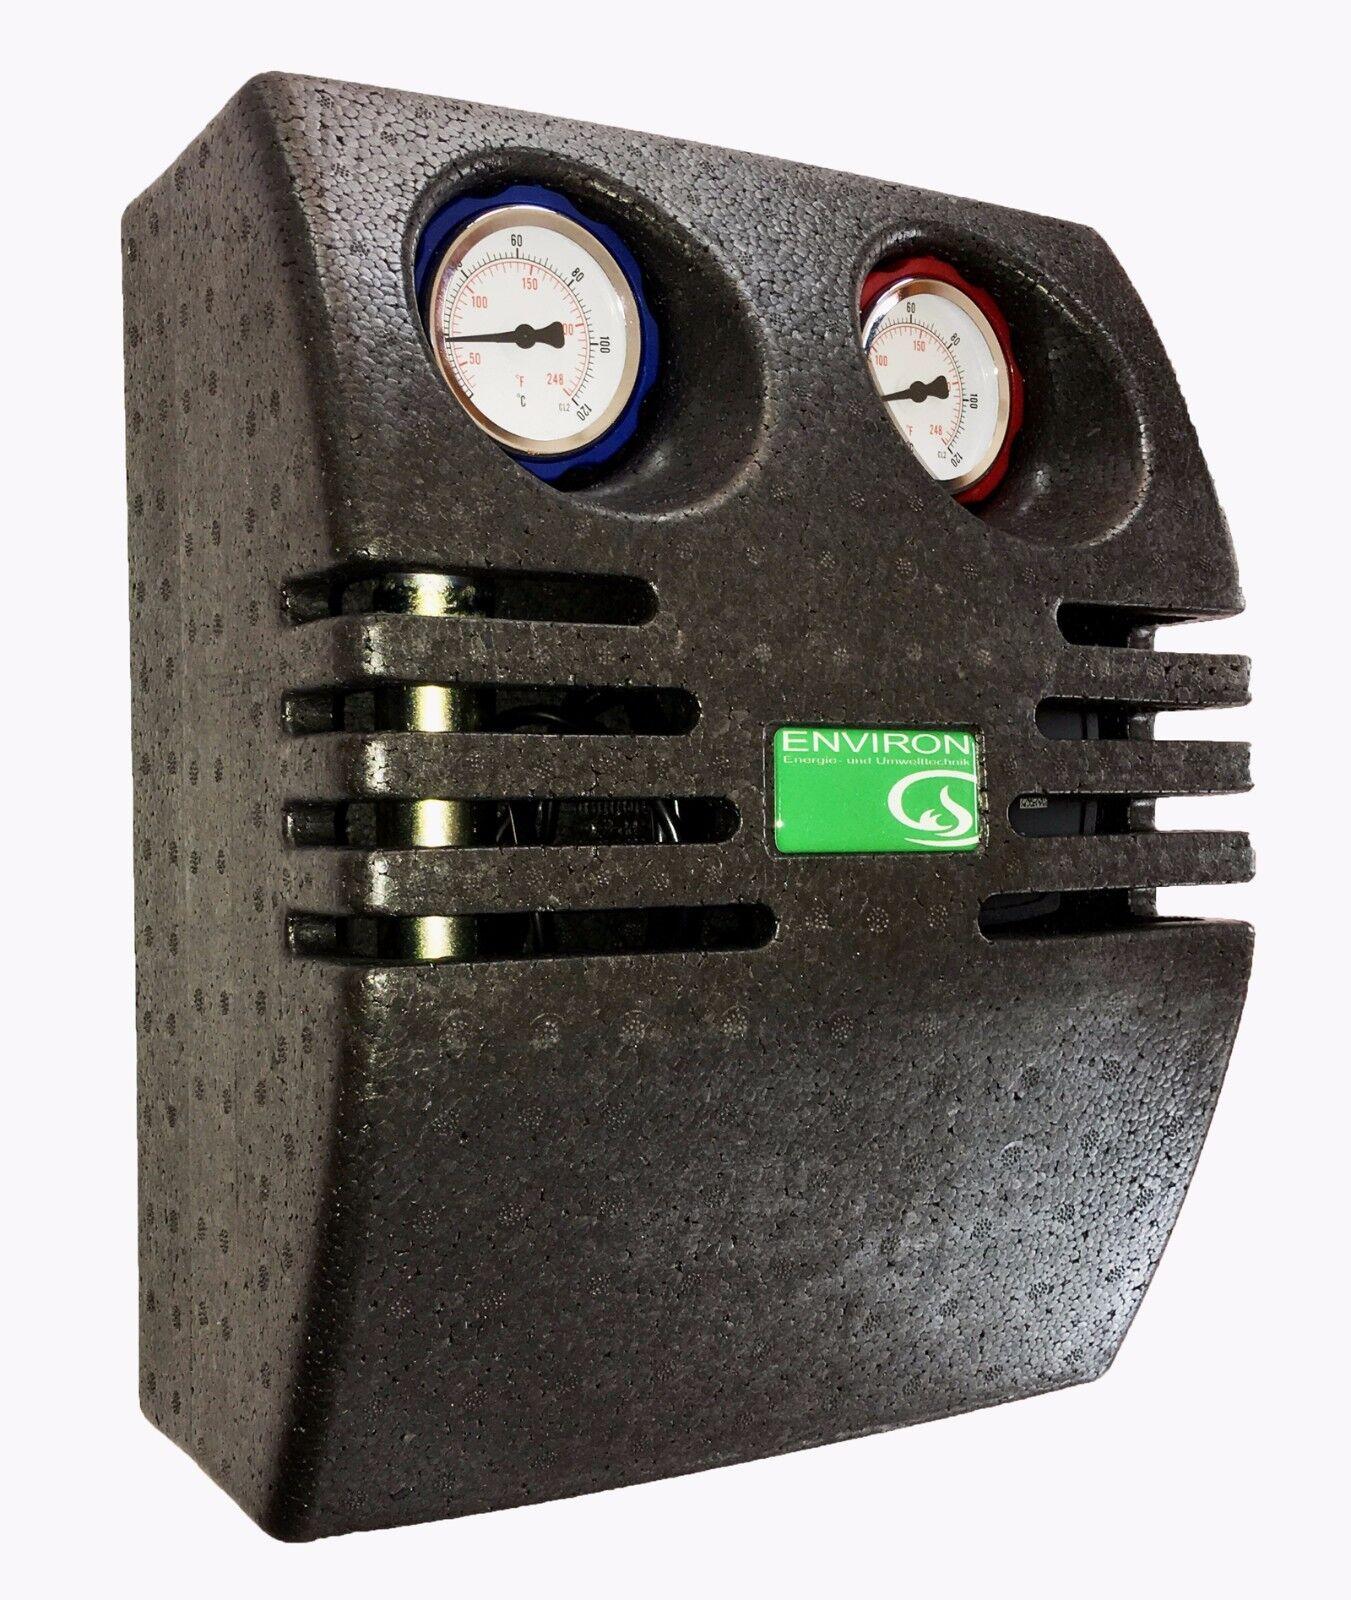 Heizkreisset Mischer 20-55°C o. 30-70°C ESBE Pumpengruppe Heizkreis Heizkreis Heizkreis Heizung Set da2d63